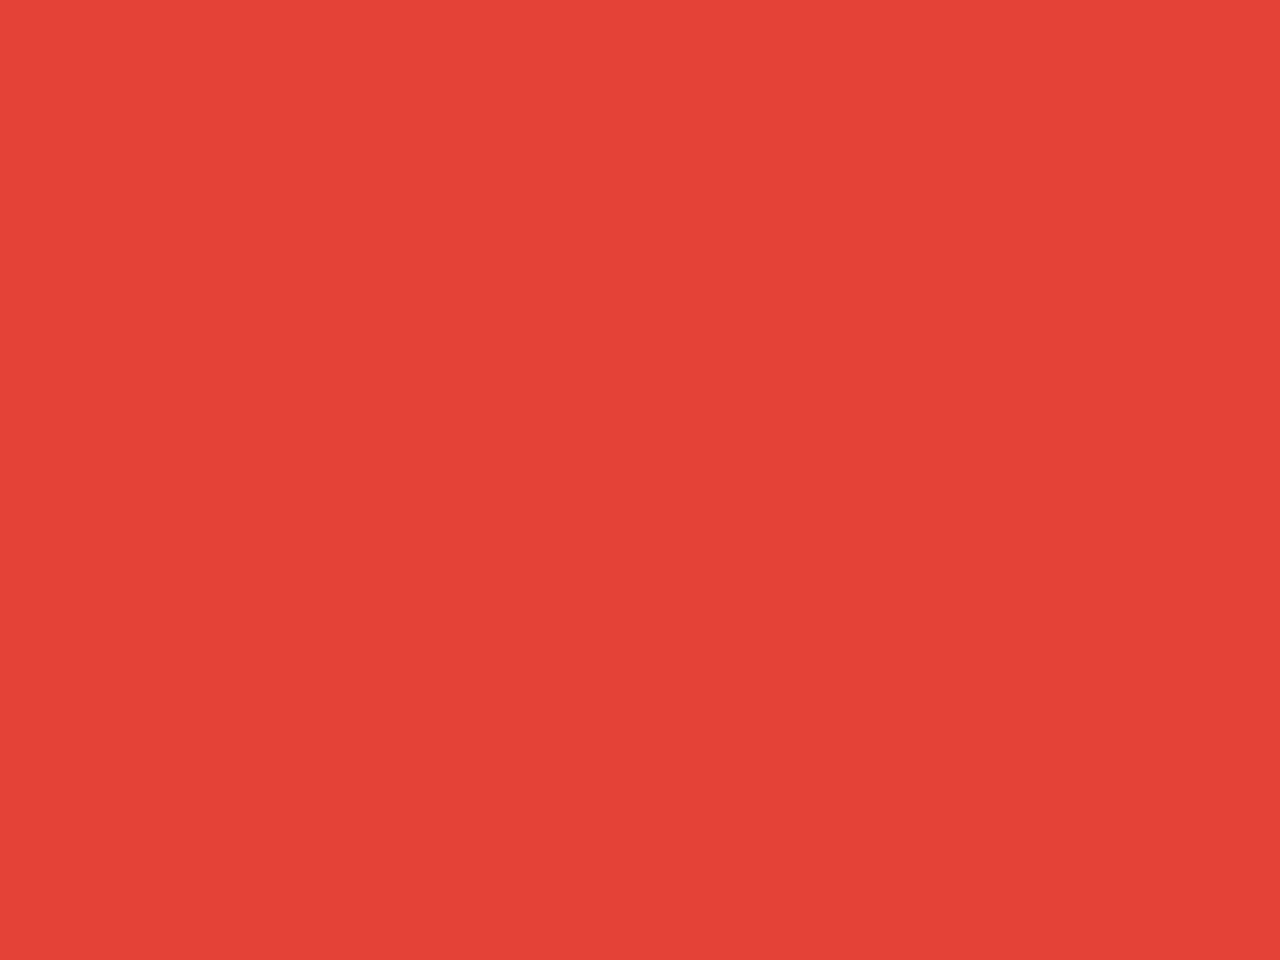 1280x960 Vermilion Cinnabar Solid Color Background